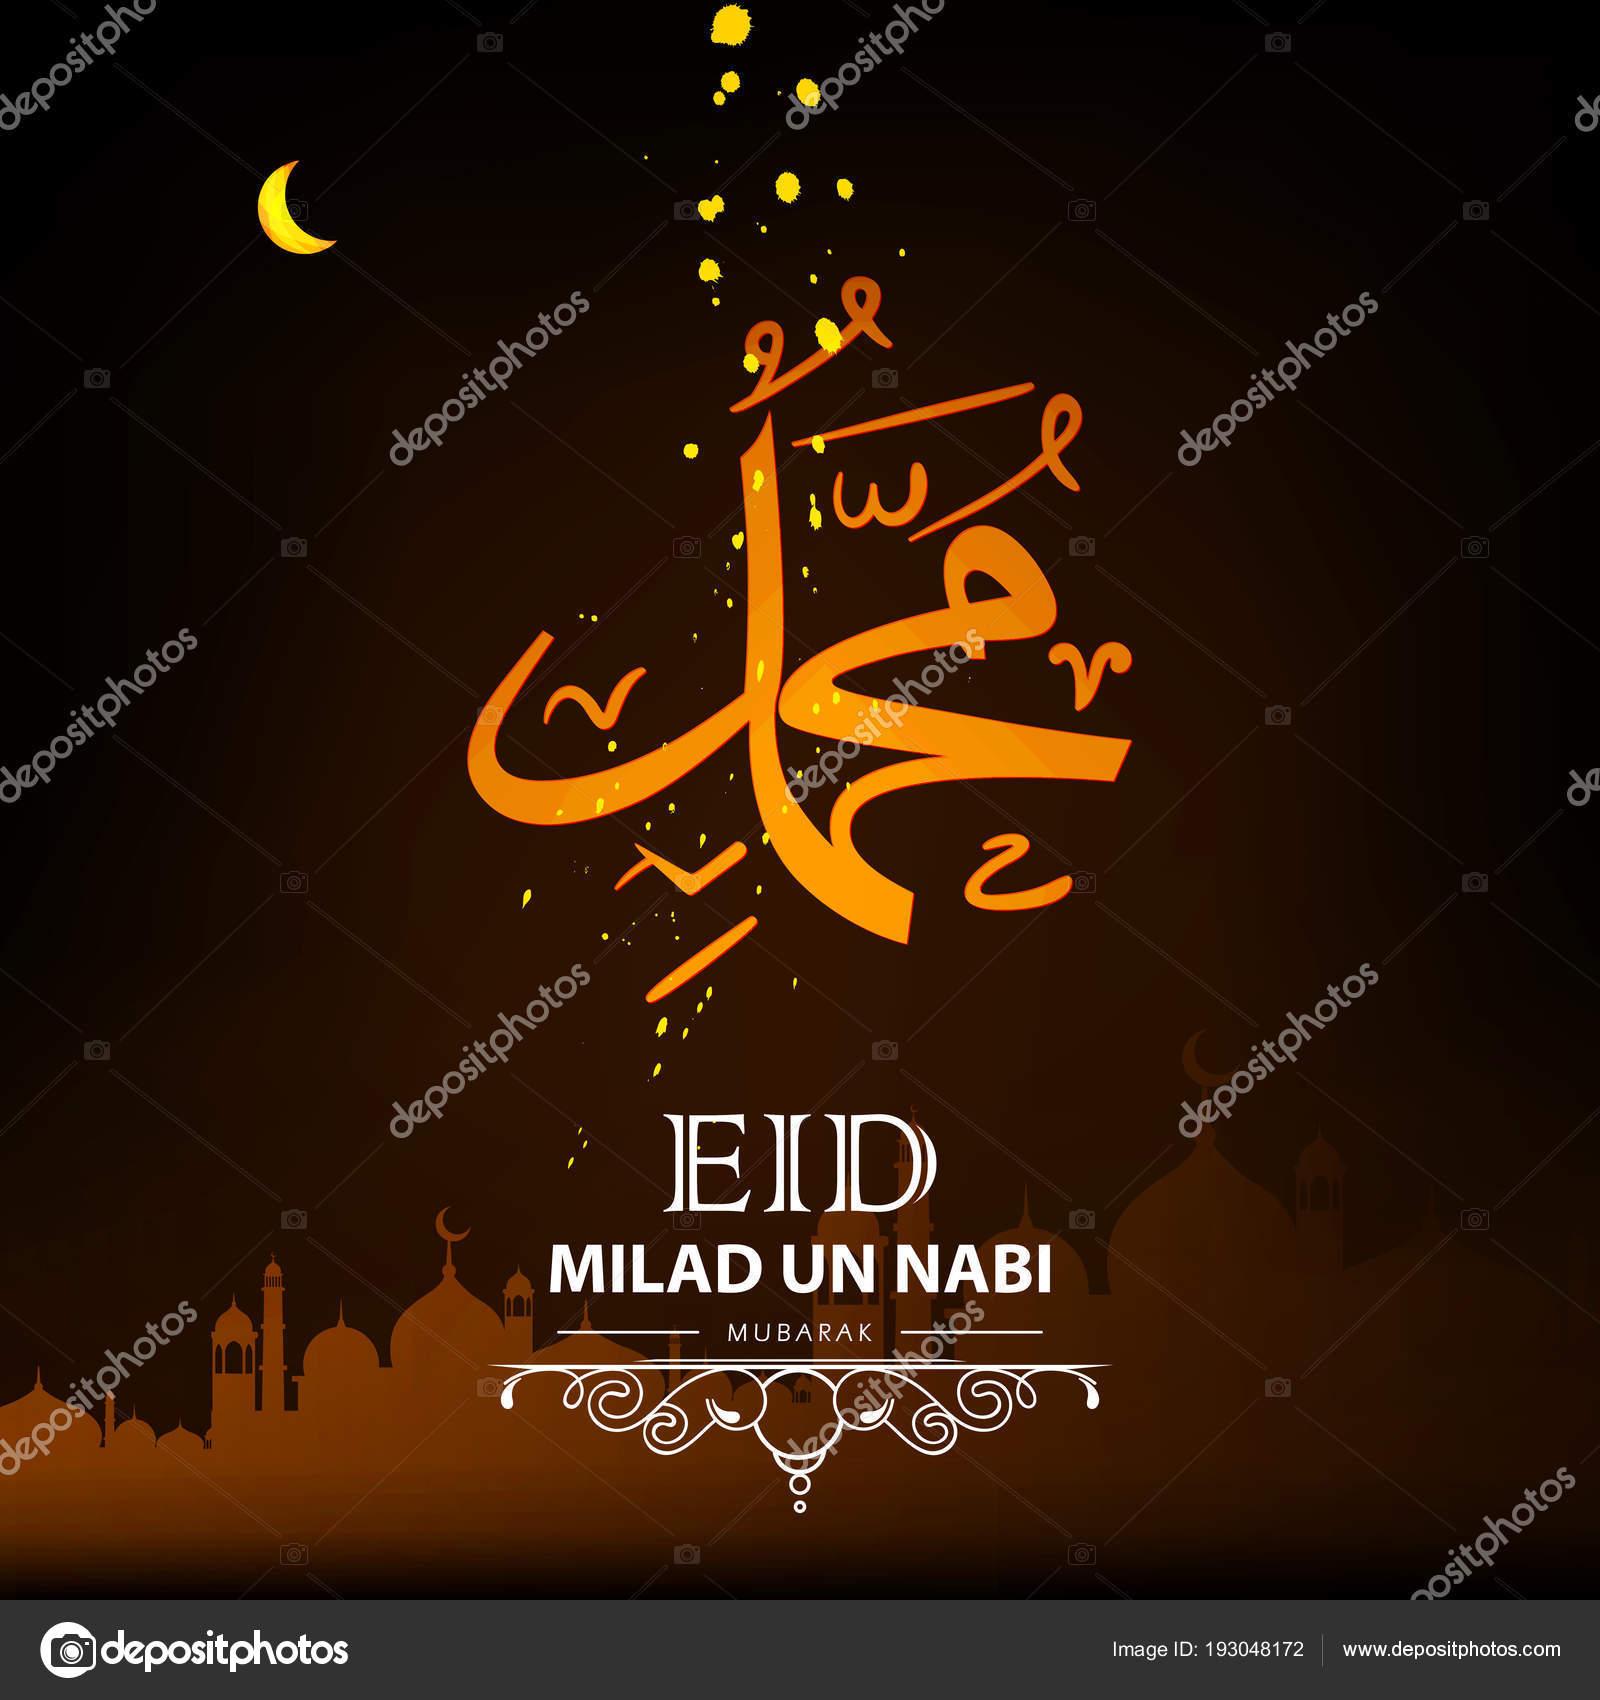 Eid Milad Nabi Mubarak Card Vector Illustration Stock Vector